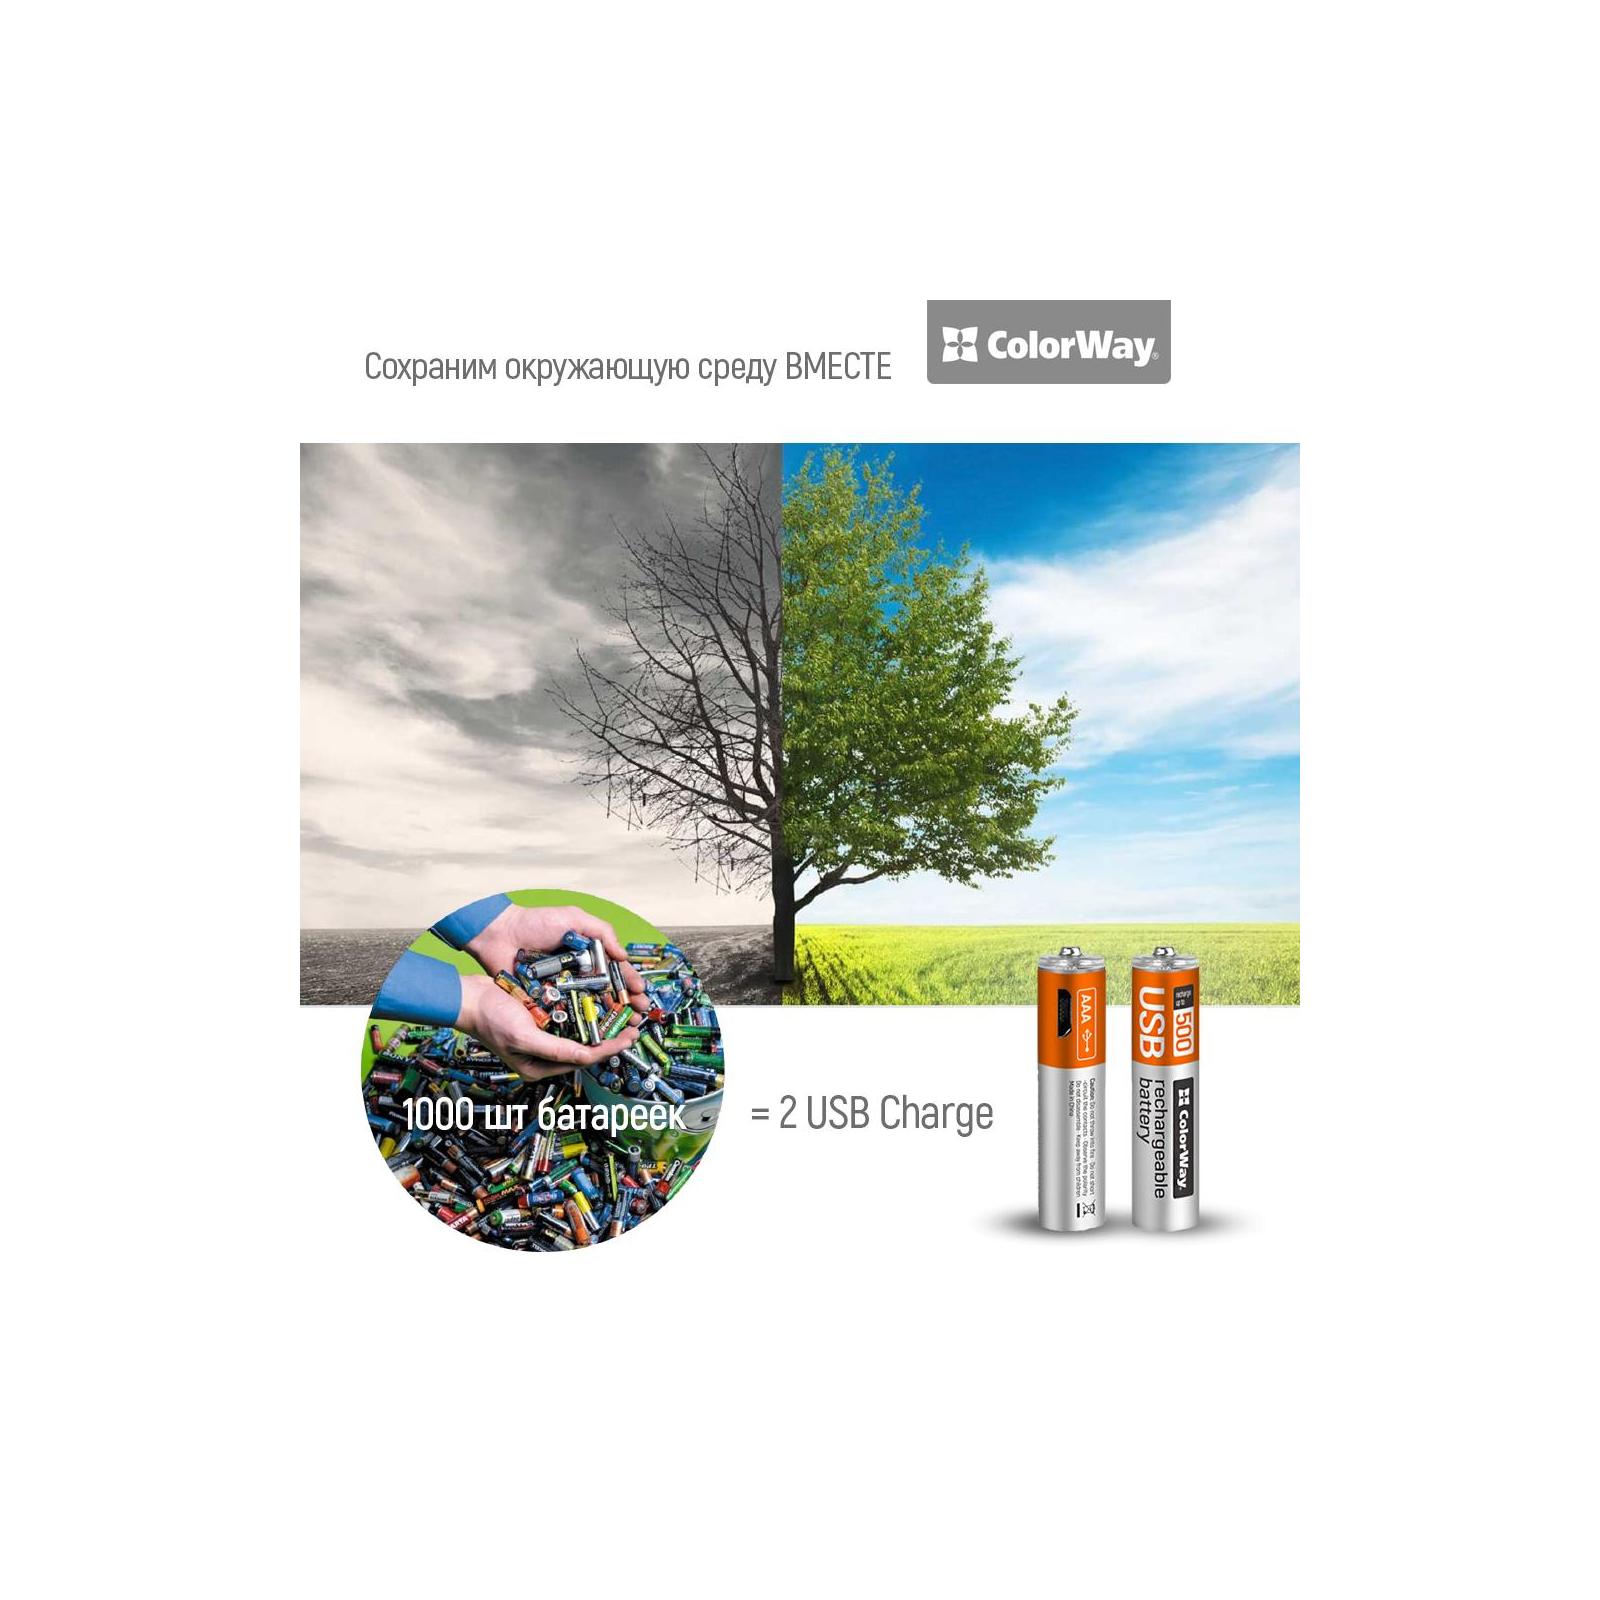 Аккумулятор ColorWay AAA micro USB 400 mAh * 2 (CW-UBAAA-01) изображение 4